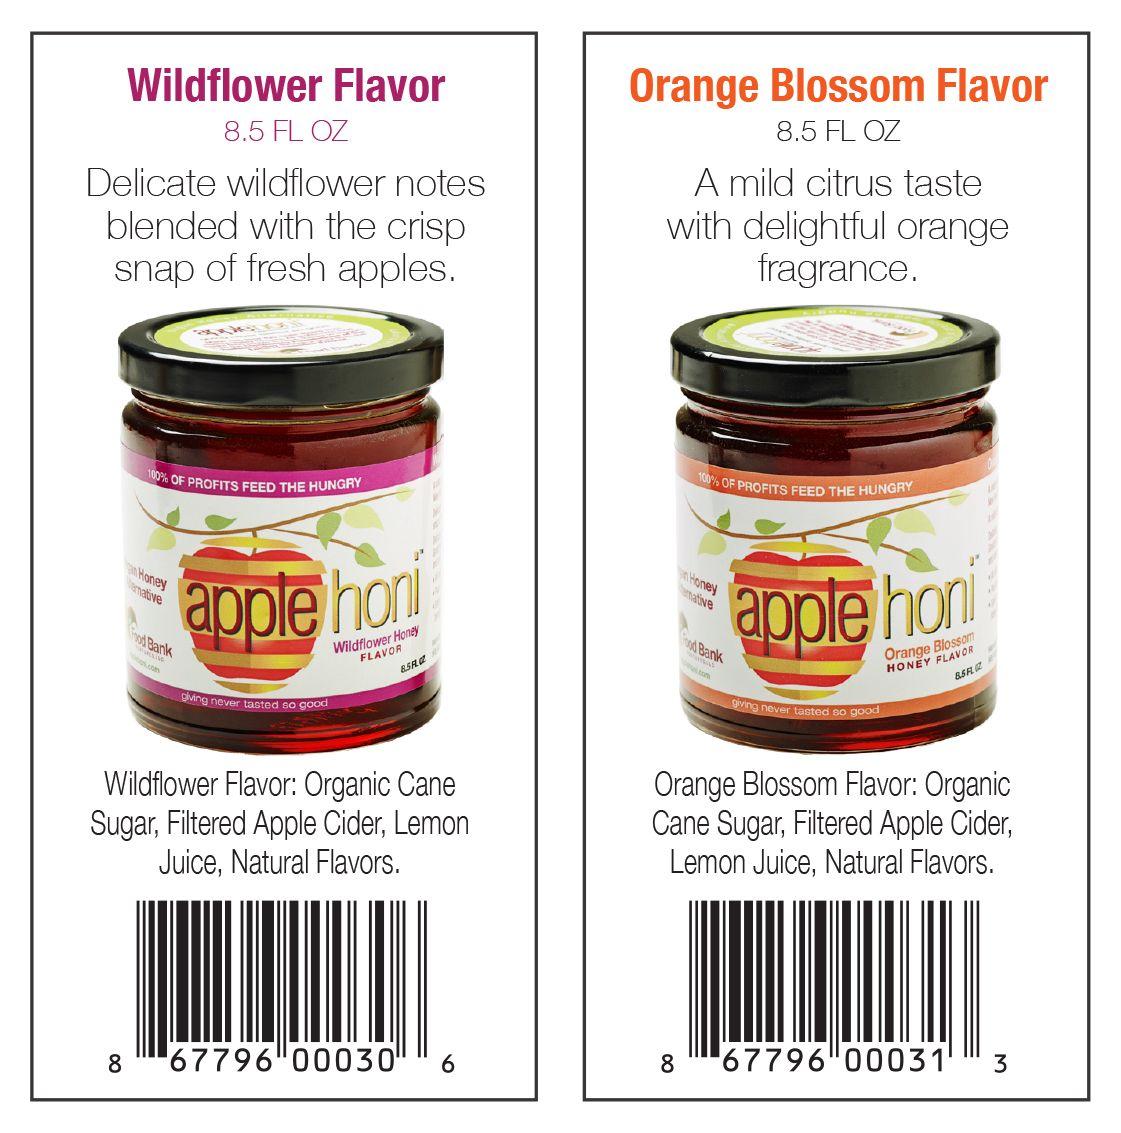 Applehoni Vegan Honey Alternative Wildflower Honey Flavor Ingredients Organic Cane Sugar Filtere Fruit Juice Concentrate Organic Sugar Natural Flavors